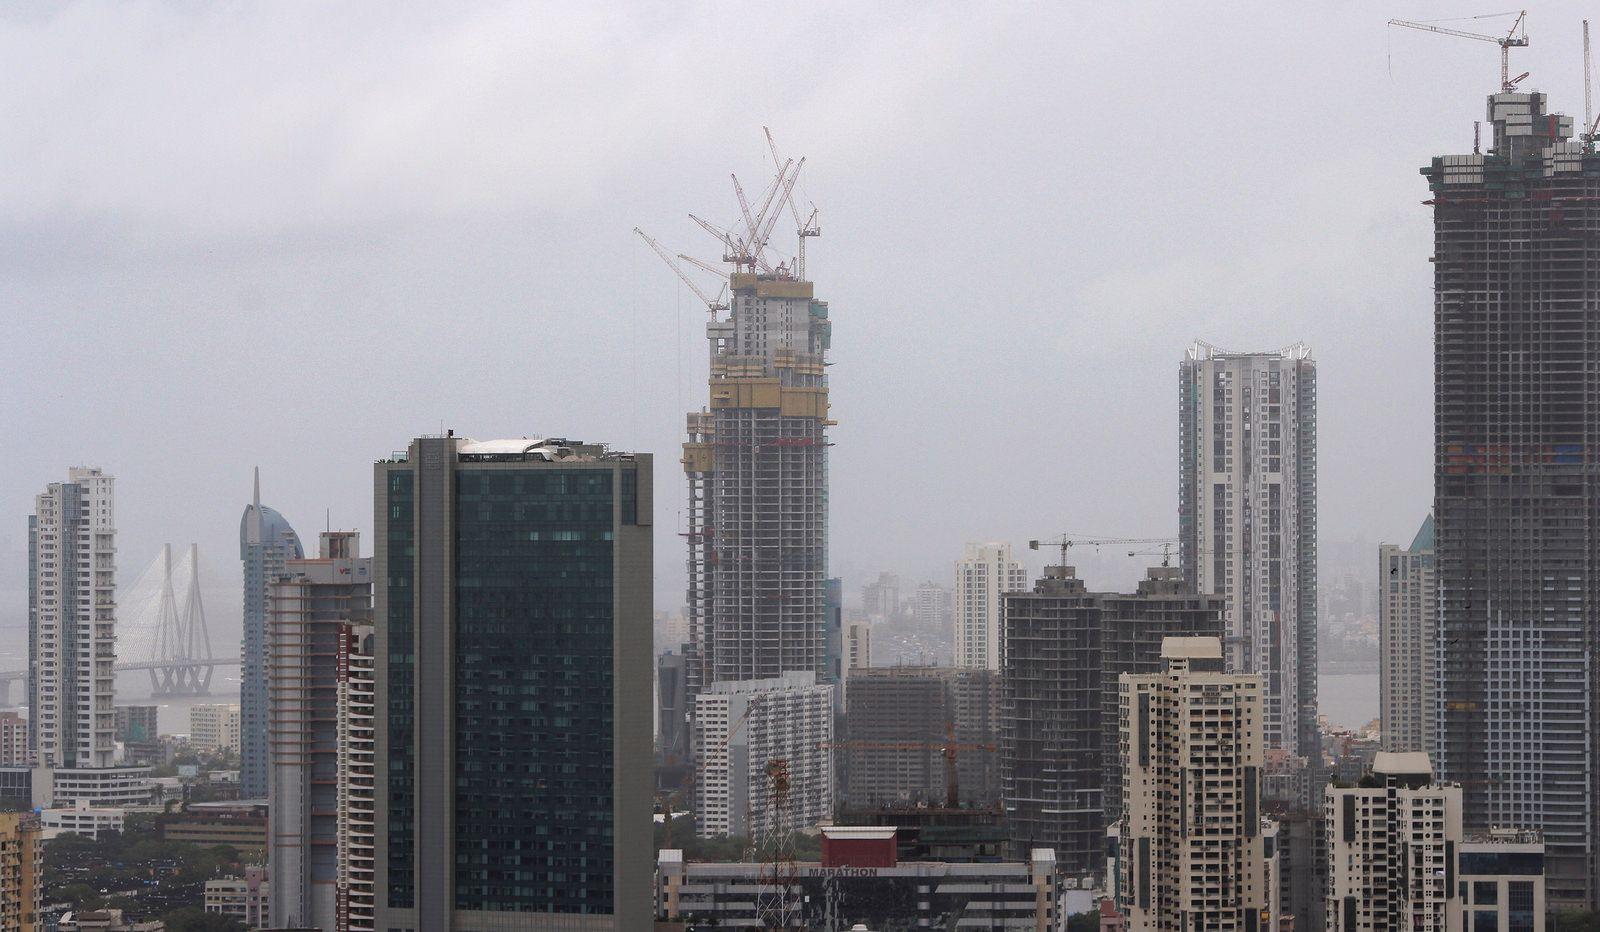 Mumbai Omkar 1973 Worli 320m 1050ft 78 Fl 300m 984ft 77 Fl 280m 919ft 63 Fl U C Page 9 New York Skyline San Francisco Skyline Skyline